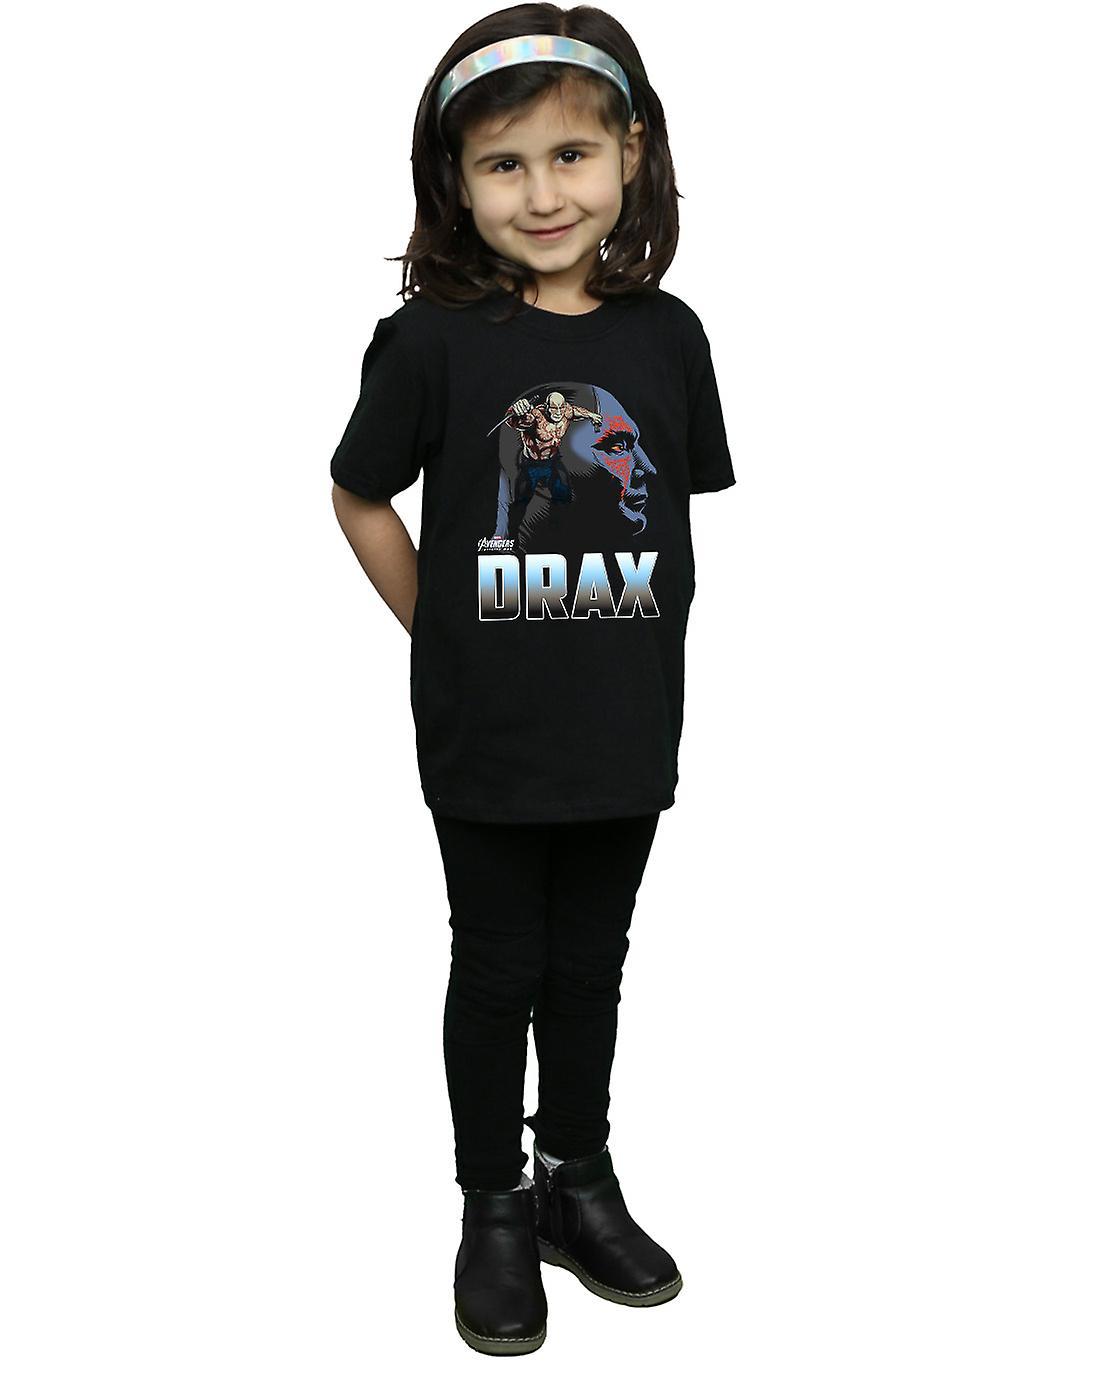 Avengers Girls Infinity War Drax Character T-Shirt